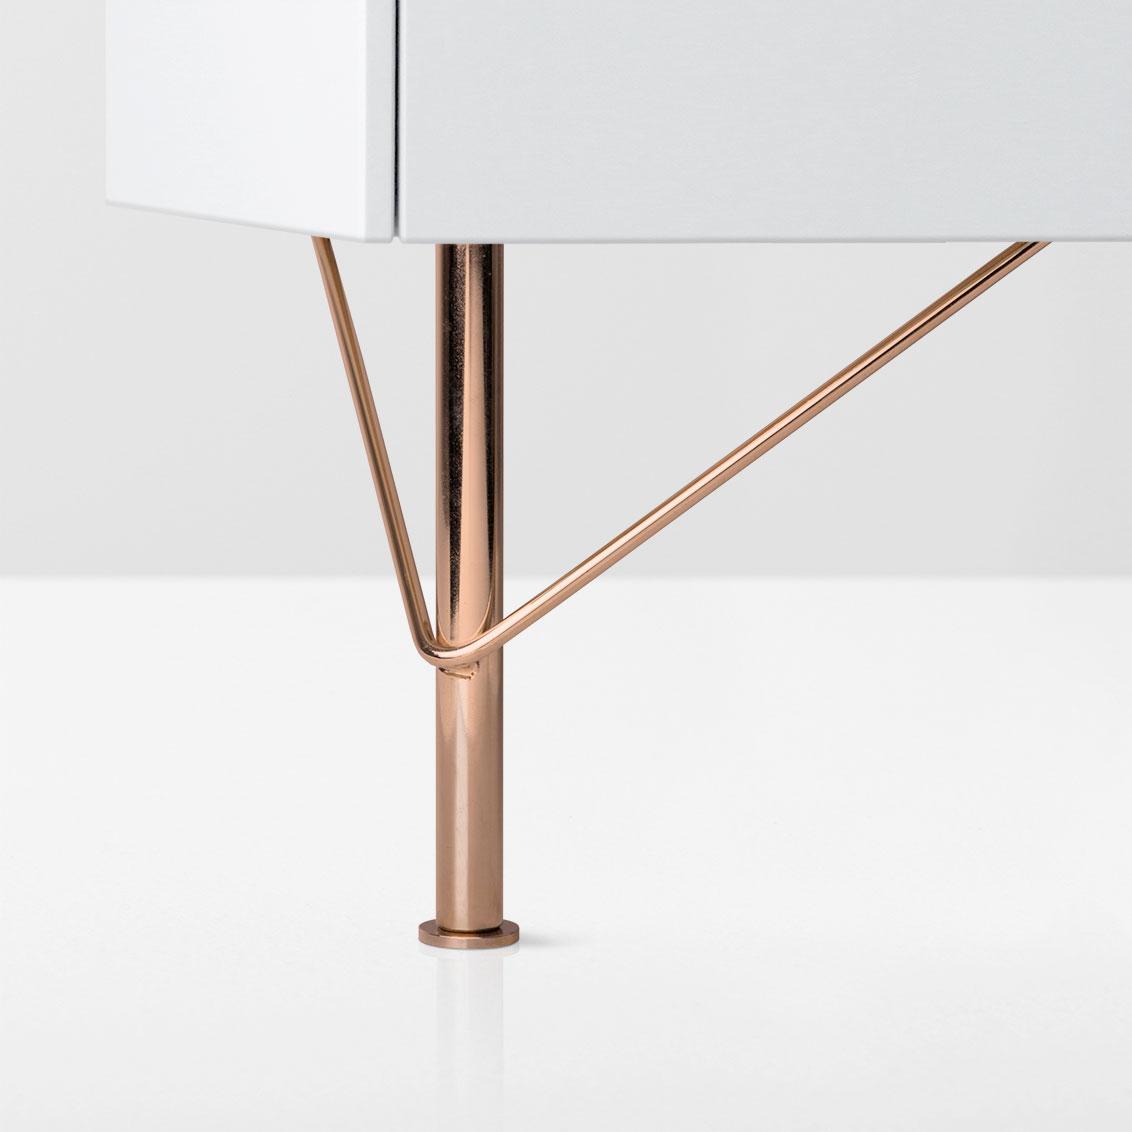 Besta Ikea Cabinet Very Goods Slender Low Furniture Legs Legs Superfront